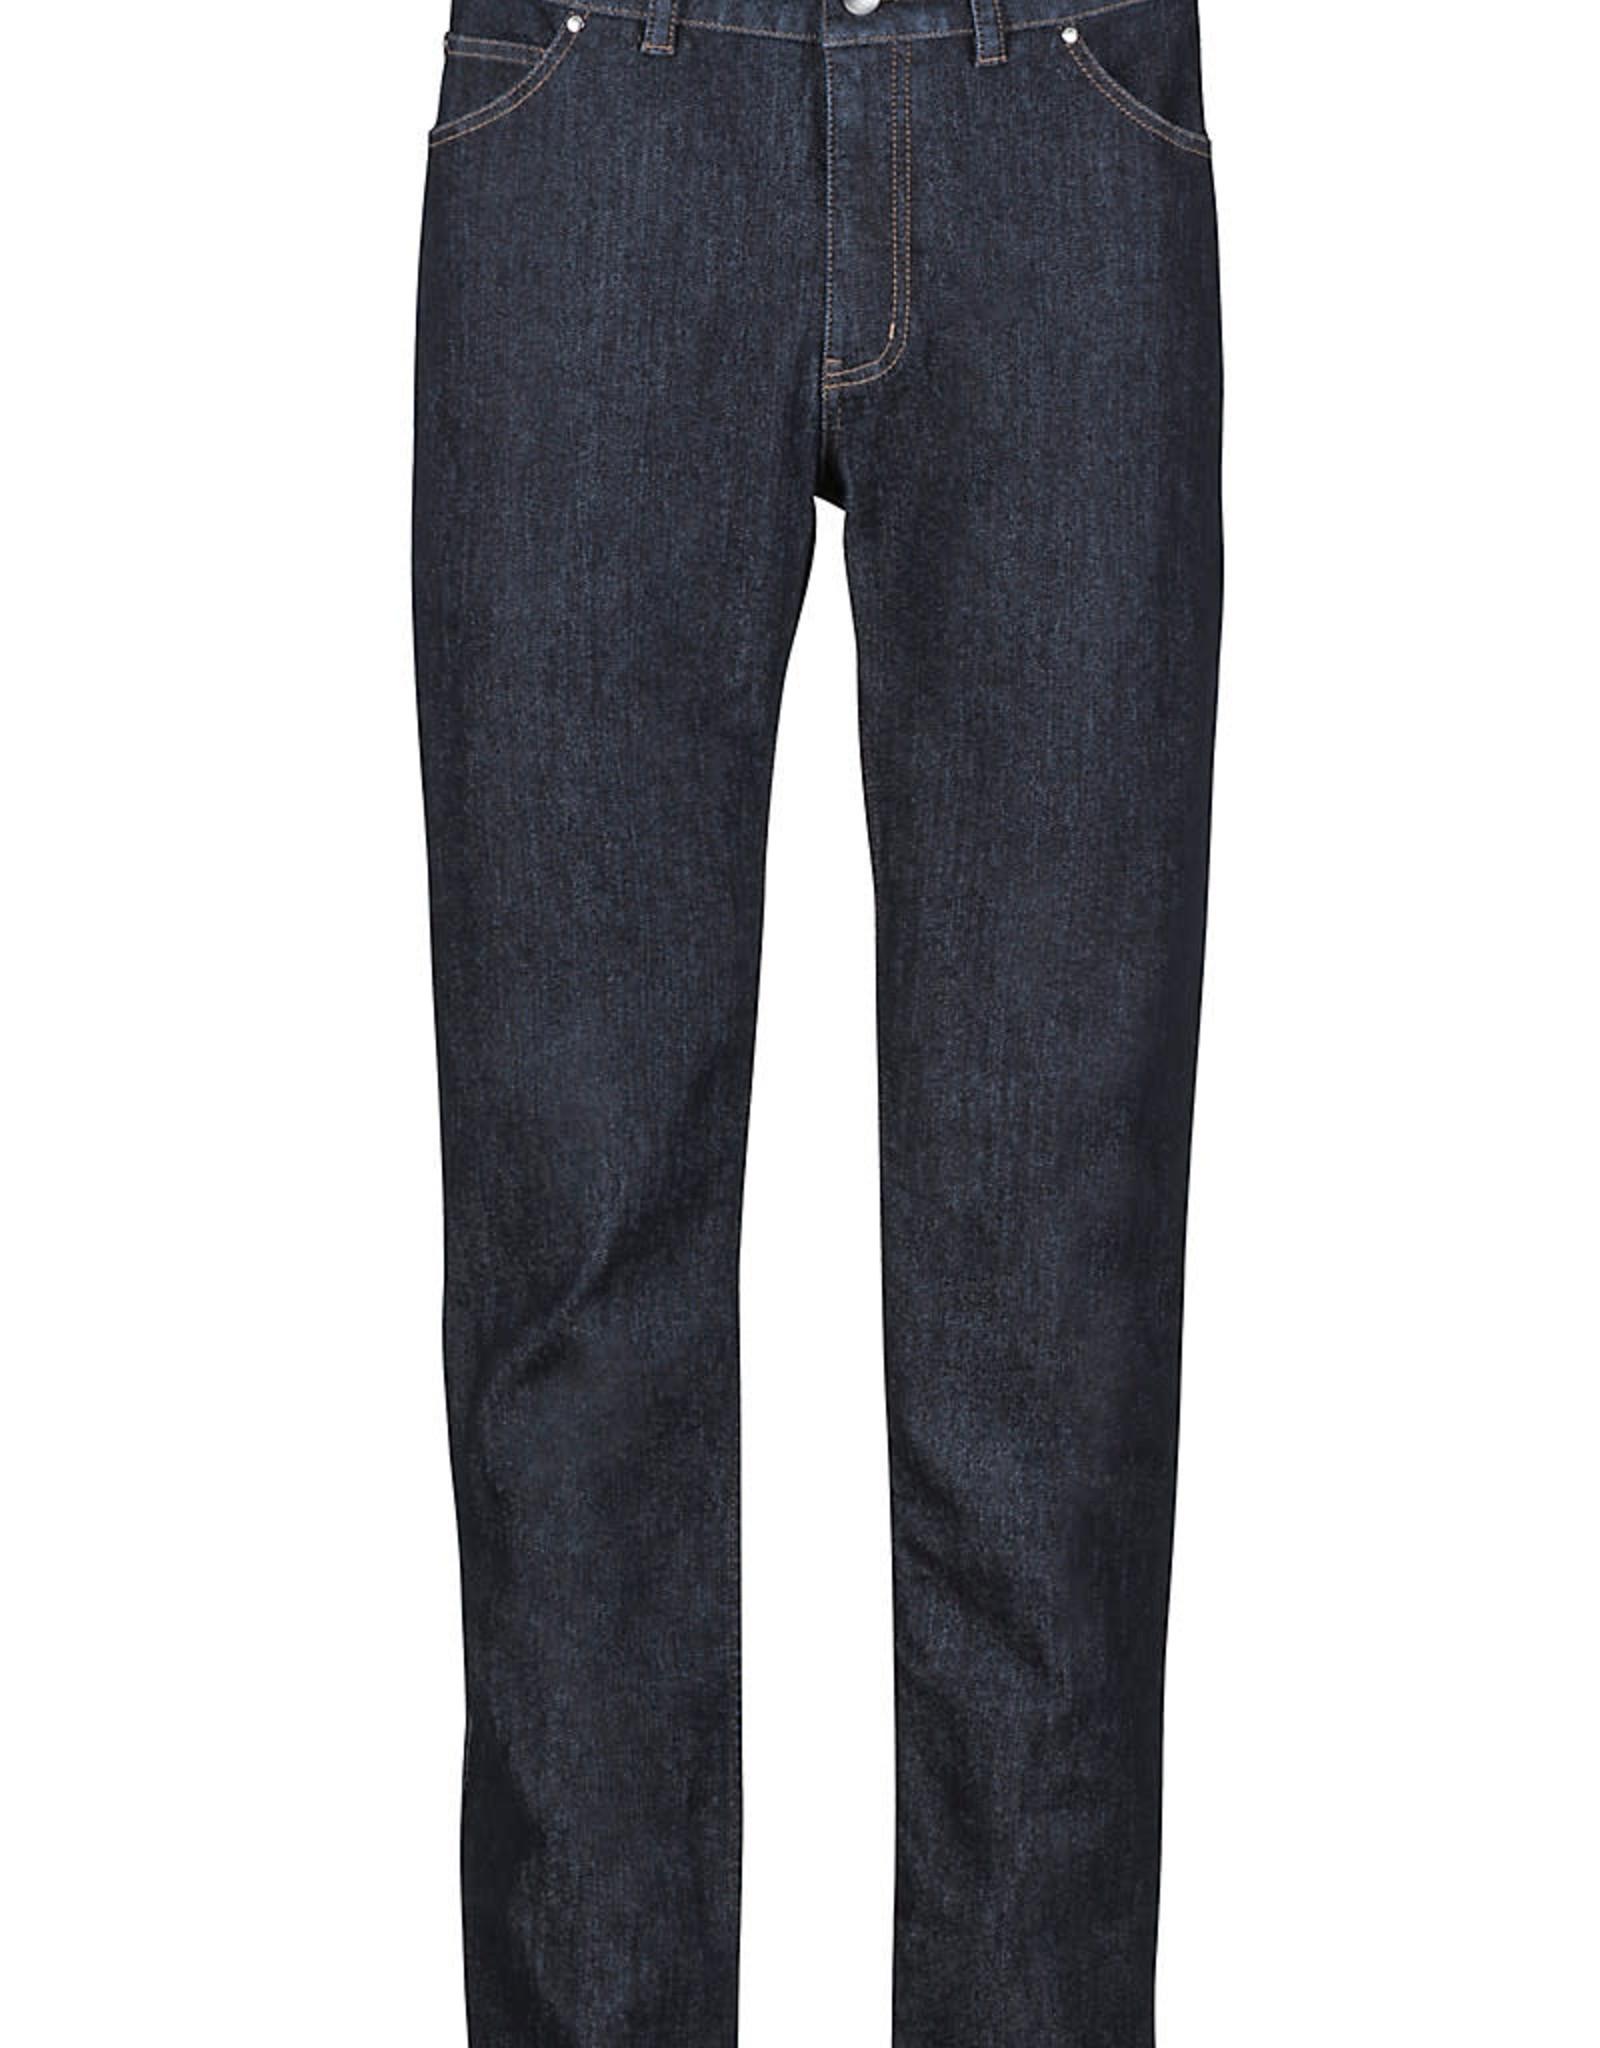 ExOfficio Dylan jean